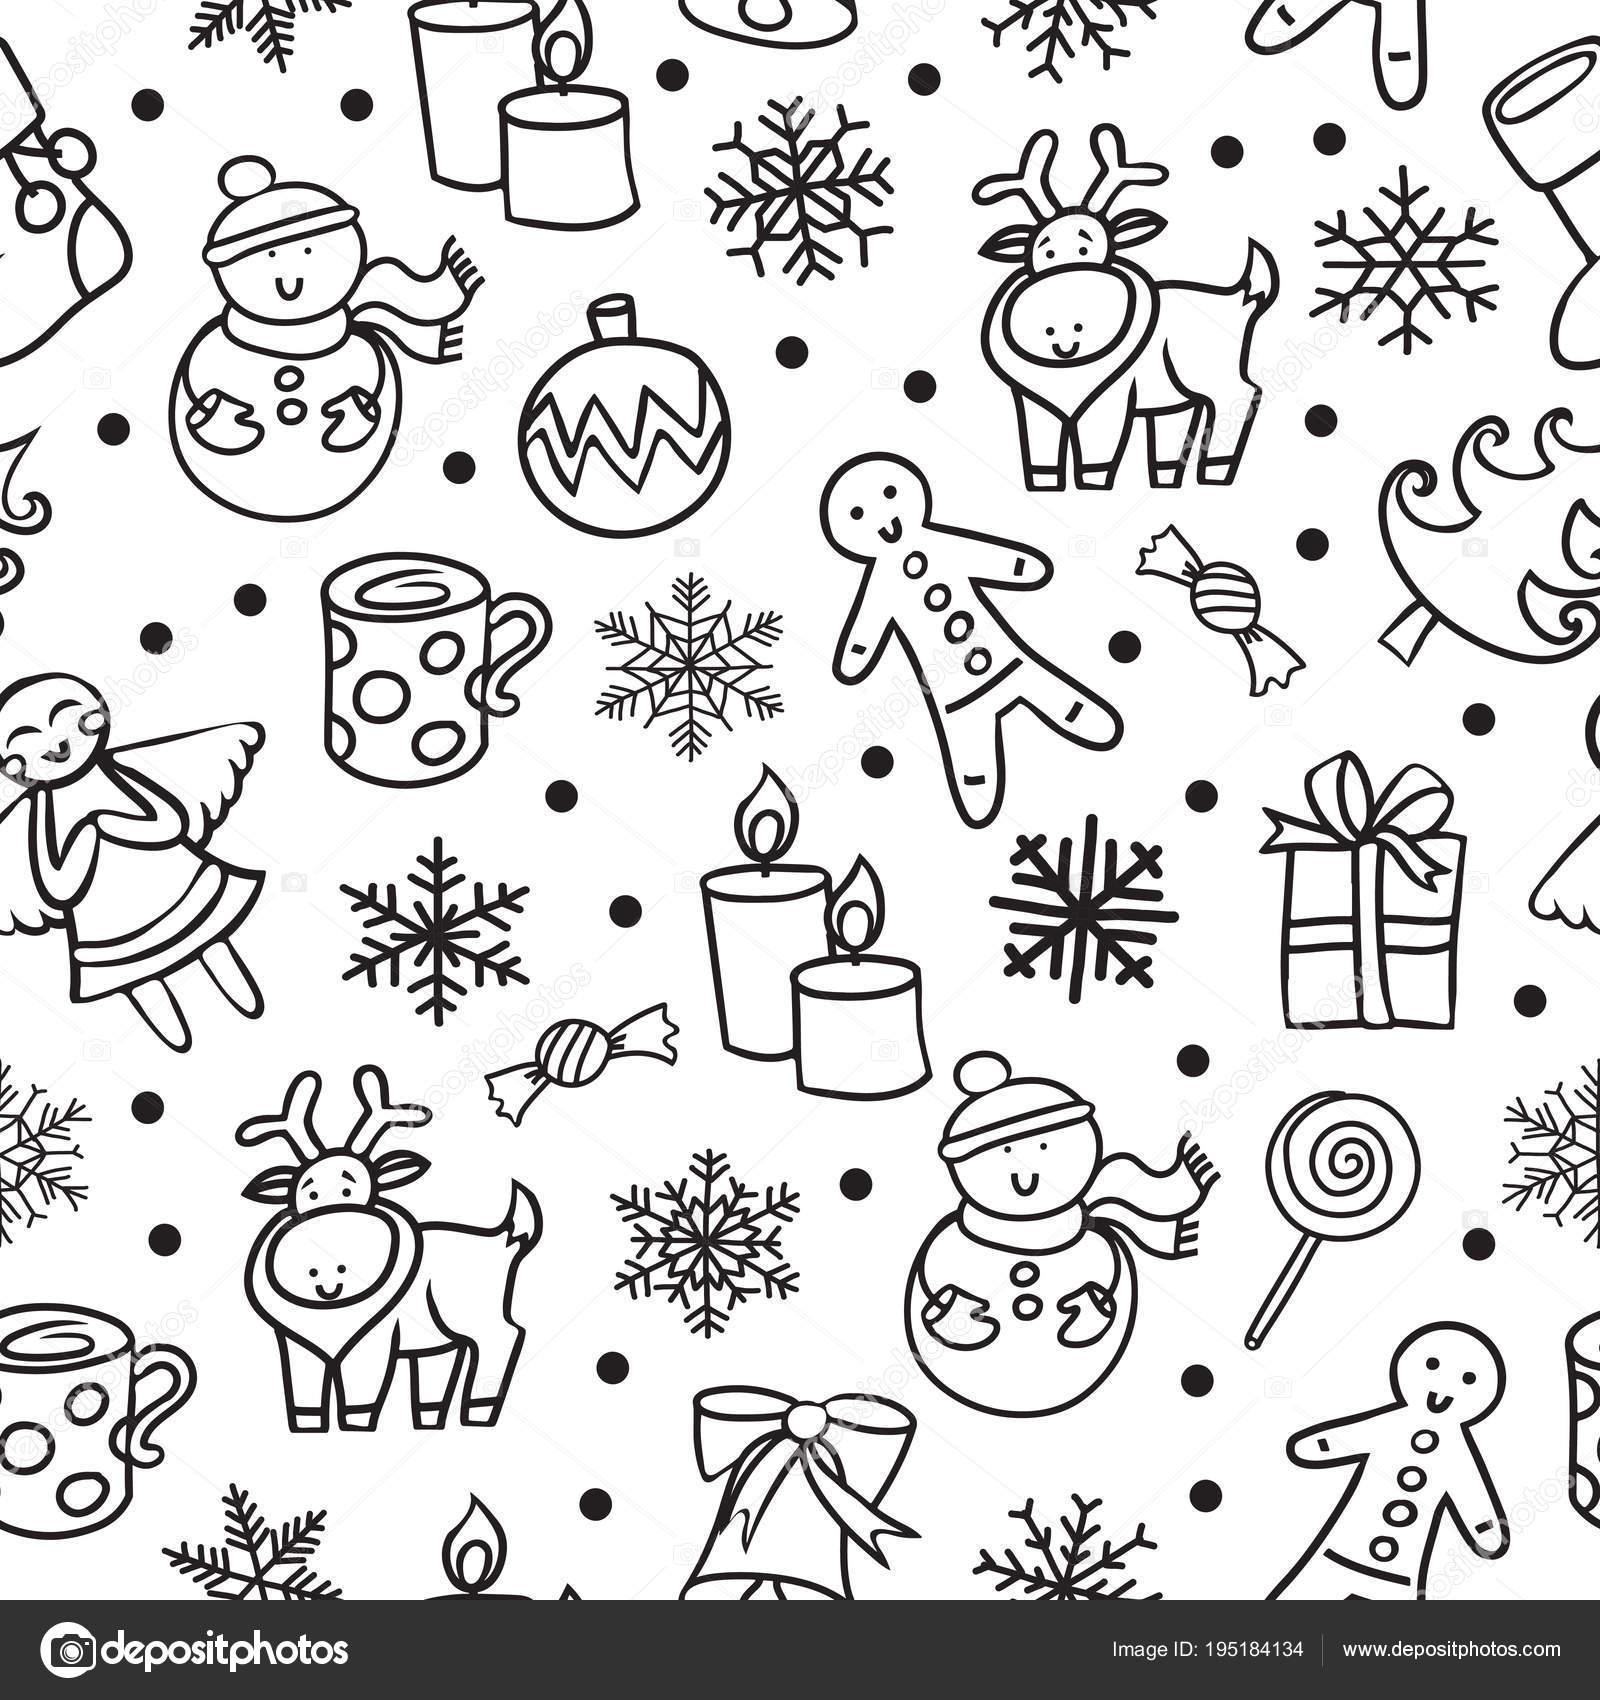 Cartoon Black White Seamless Pattern Merry Christmas Happy New Year